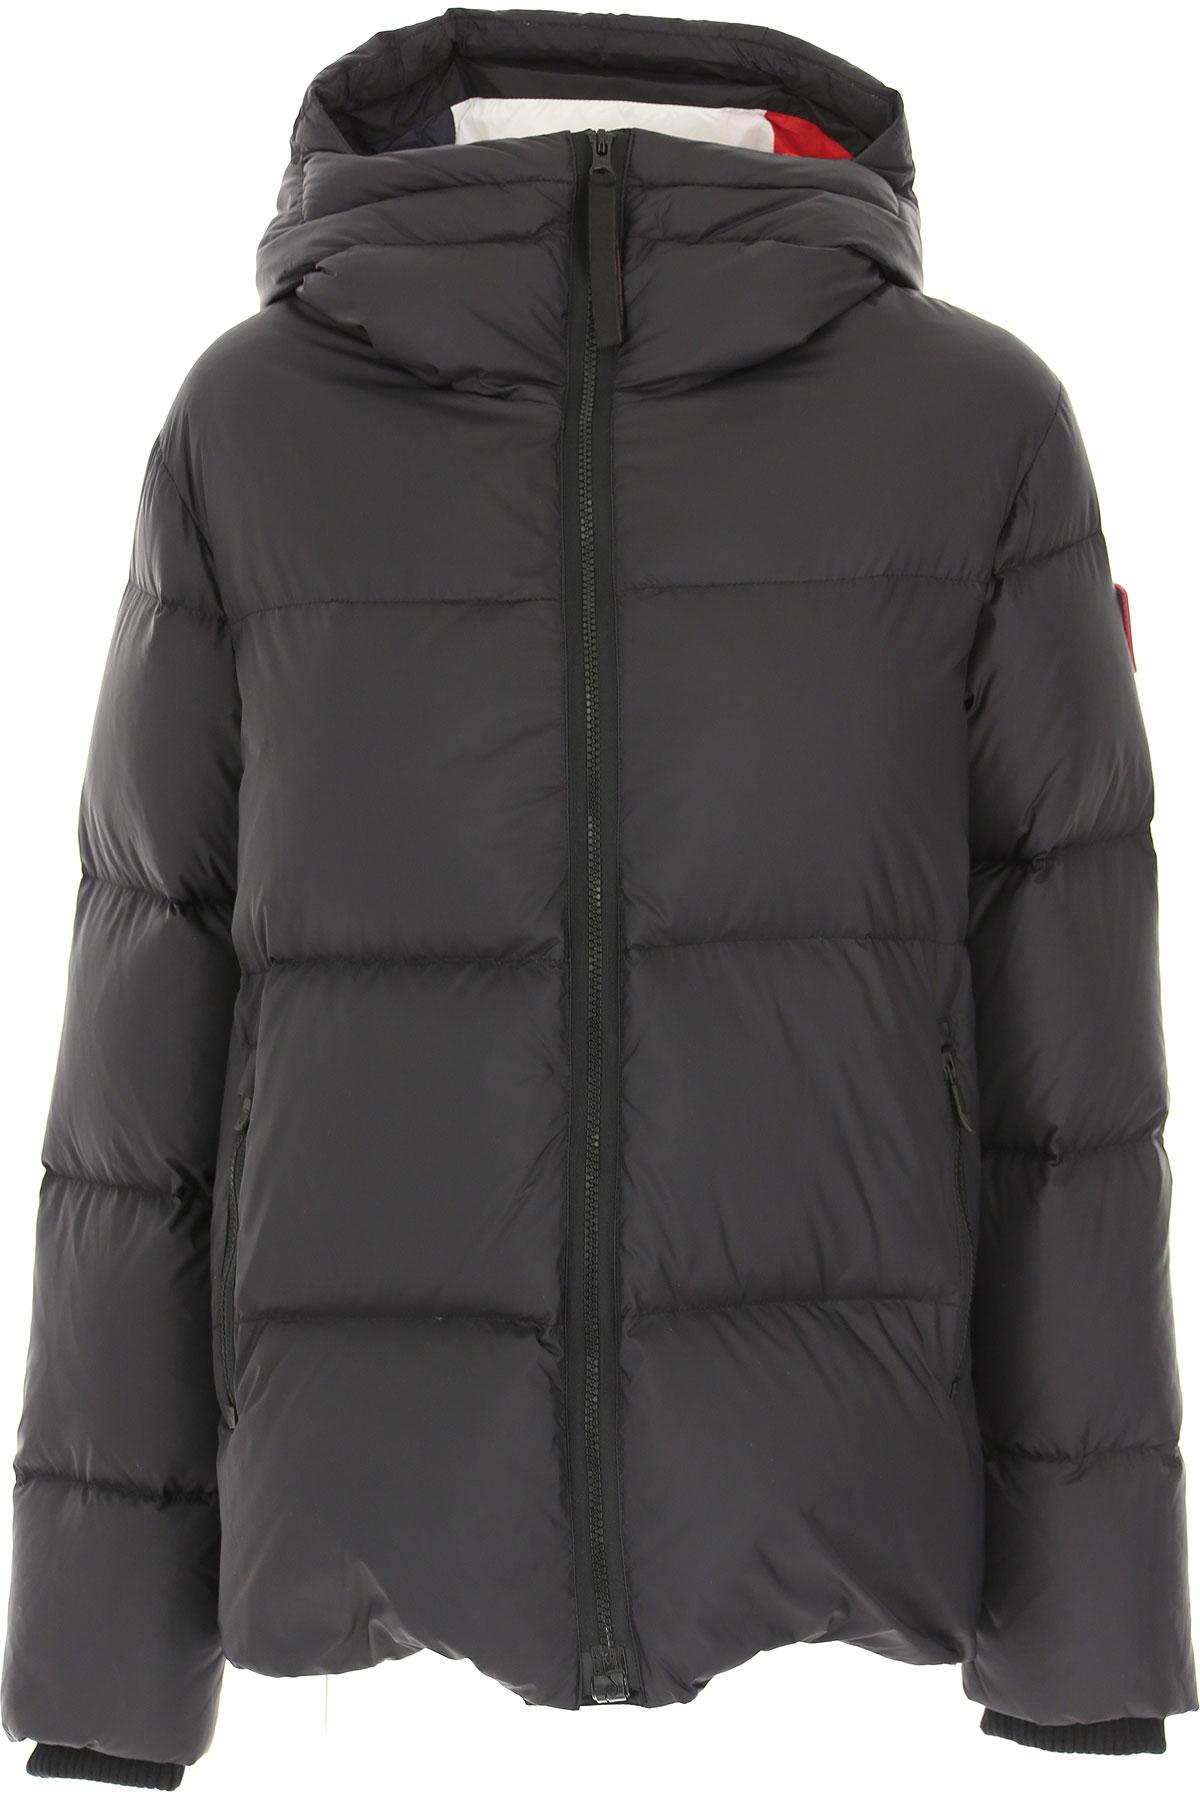 Rossignol Down Jacket for Women, Puffer Ski Jacket On Sale, Black, polyamide, 2019, 4 6 8